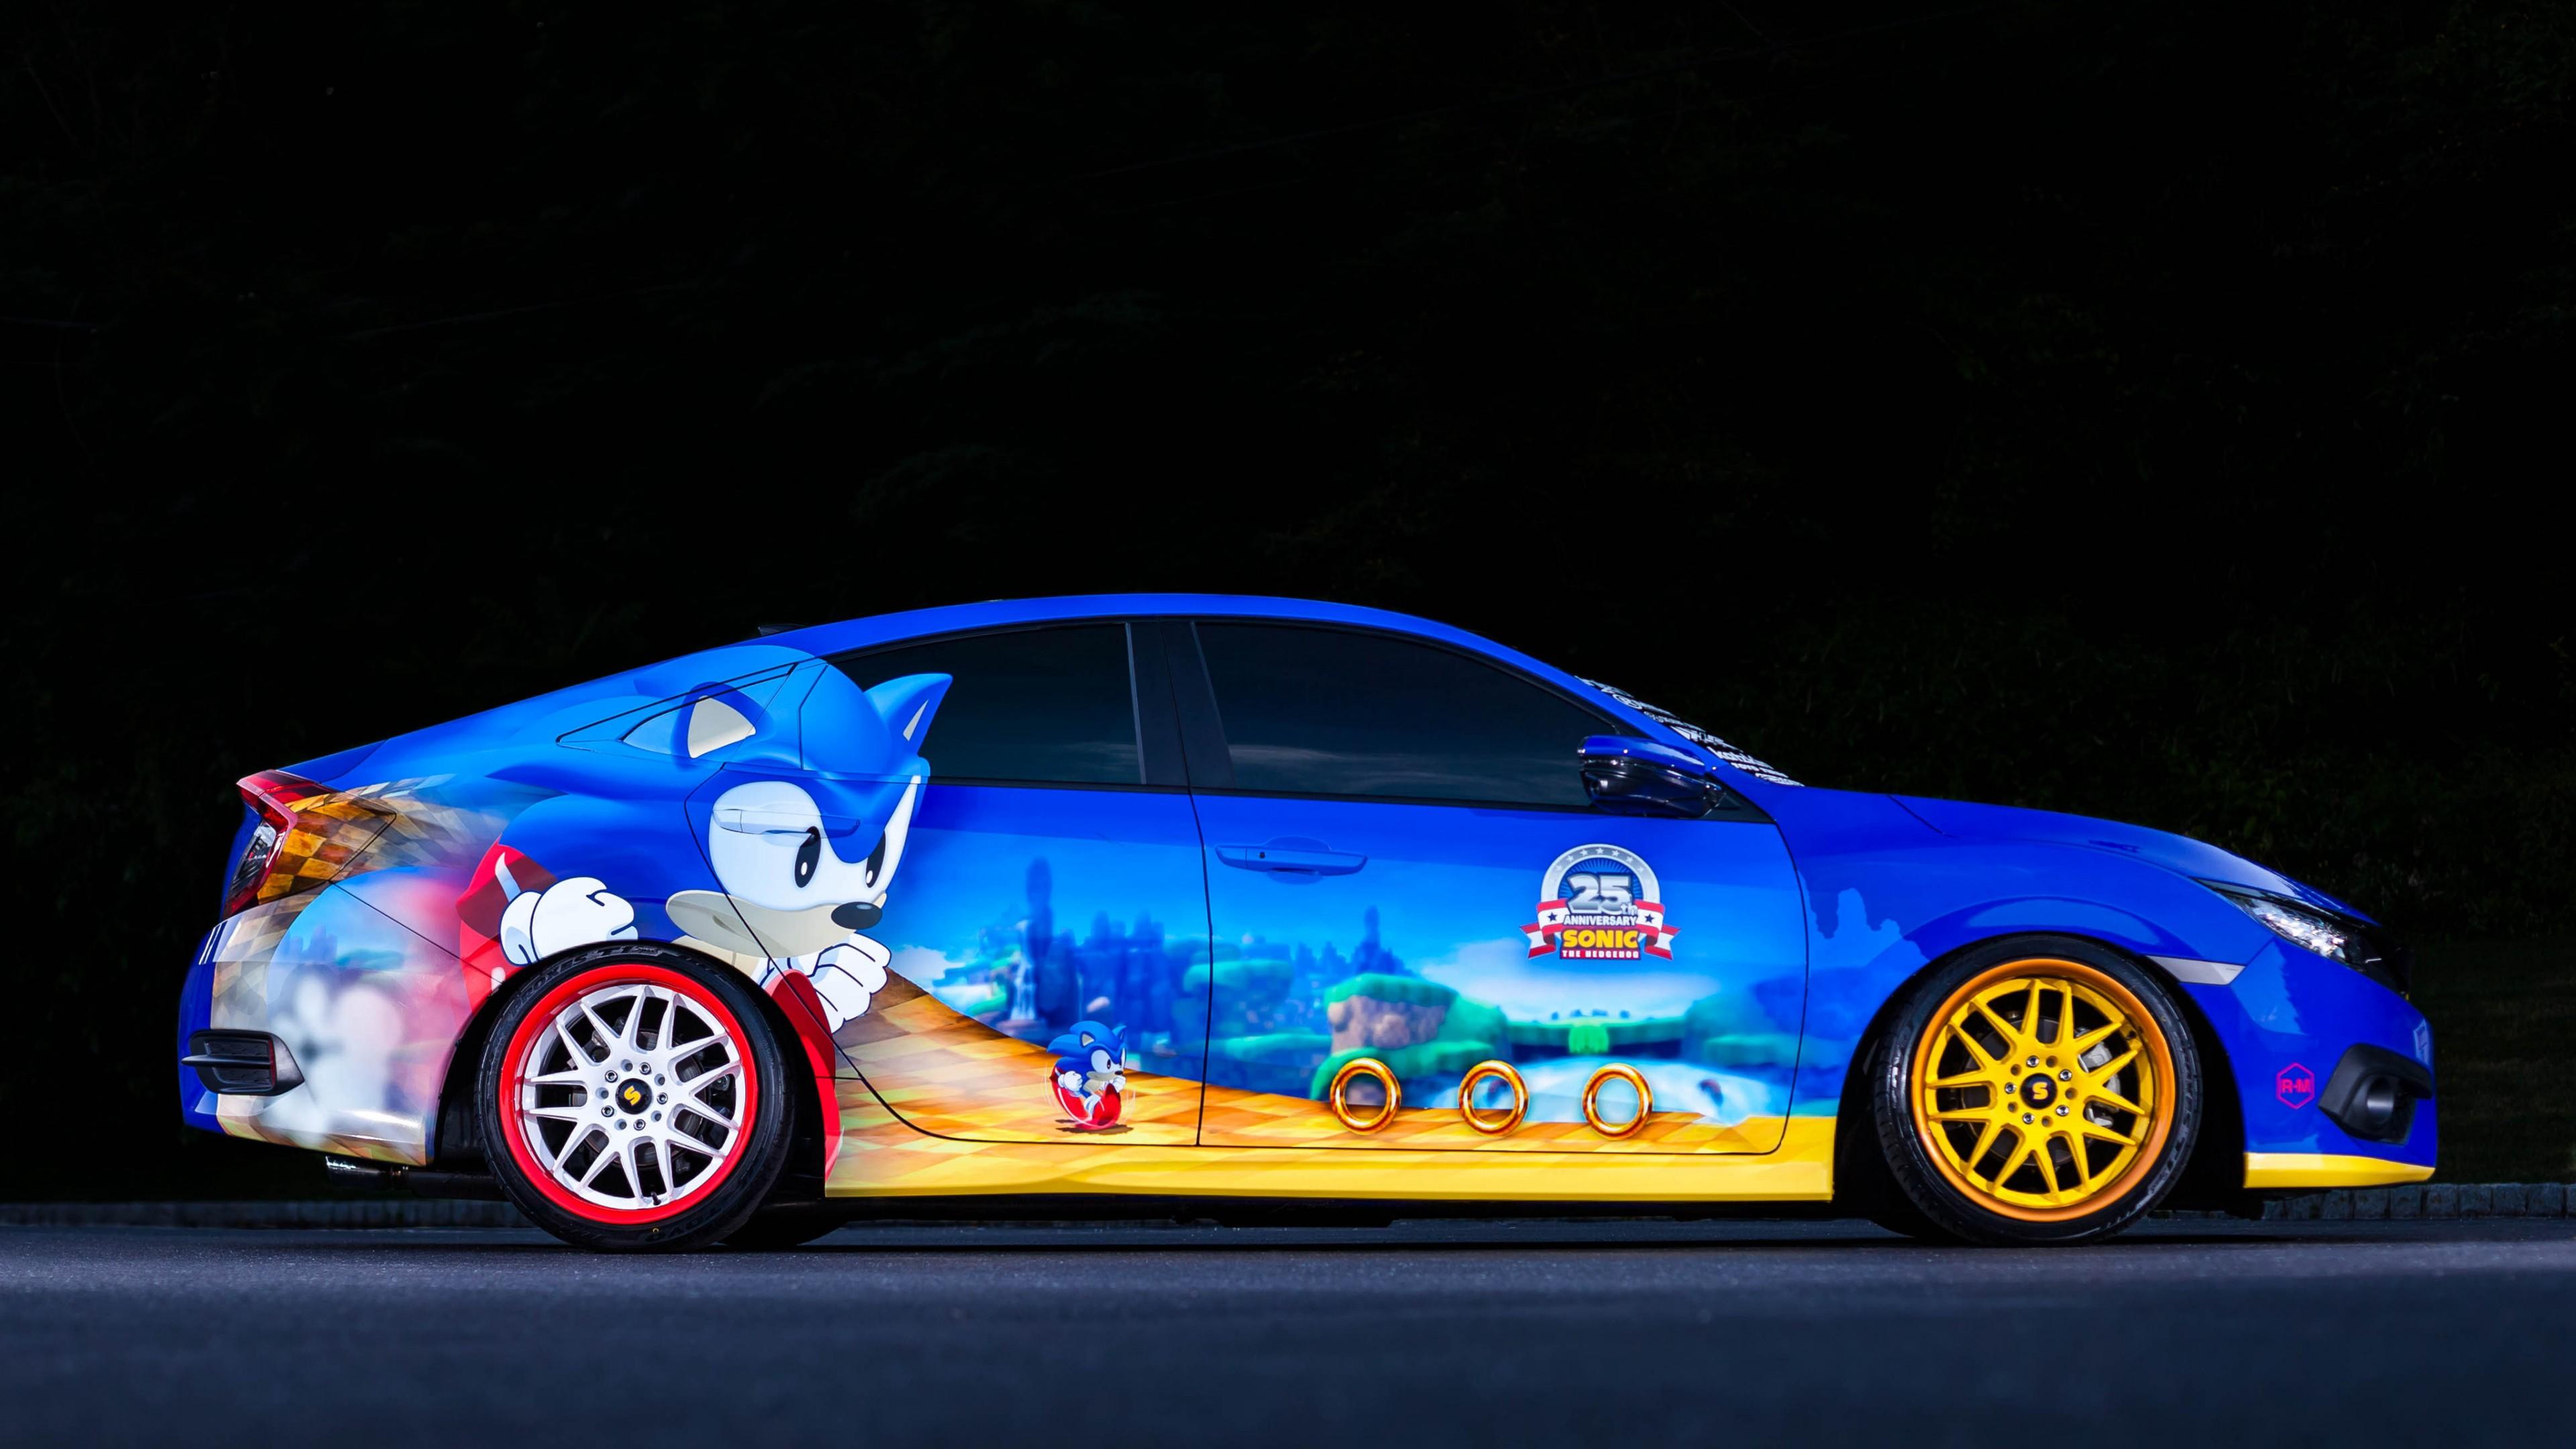 Wallpaper Honda S Sonic Civic Sedan Blue Sonic Cars